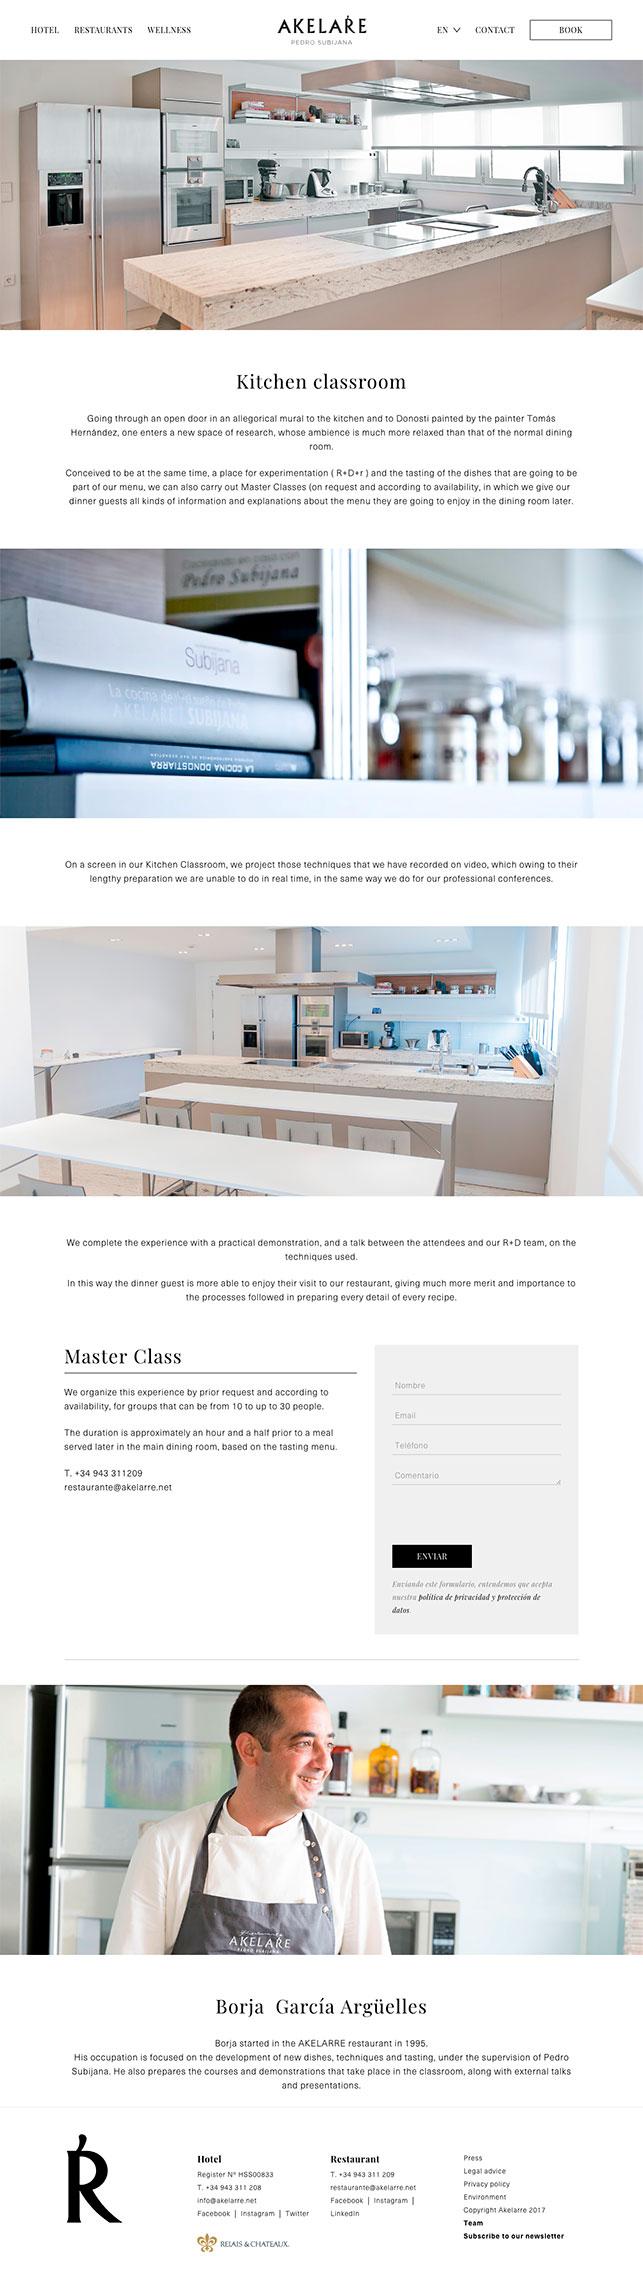 Roger-P-Akelarre-Kitchen-classroom